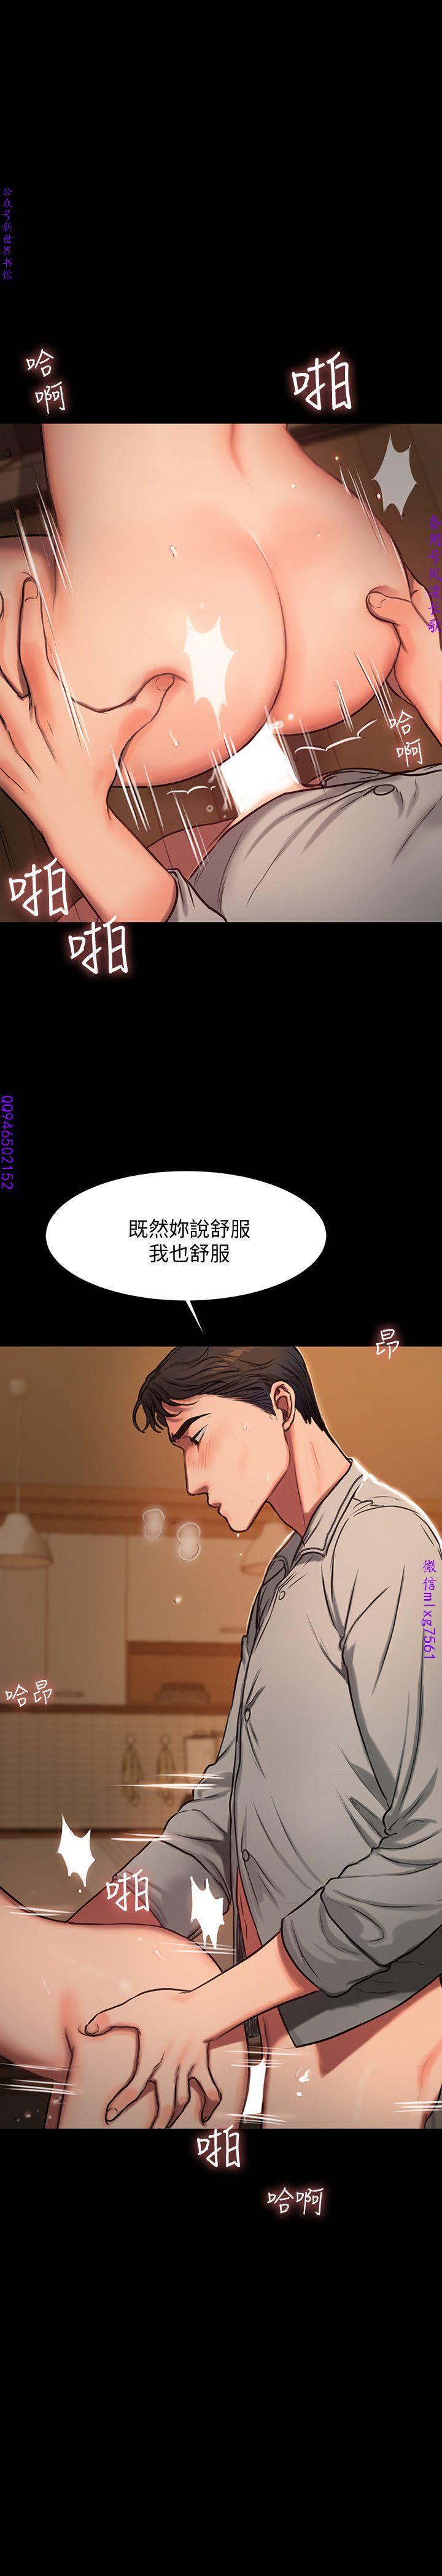 Run away 1-10【中文】 148